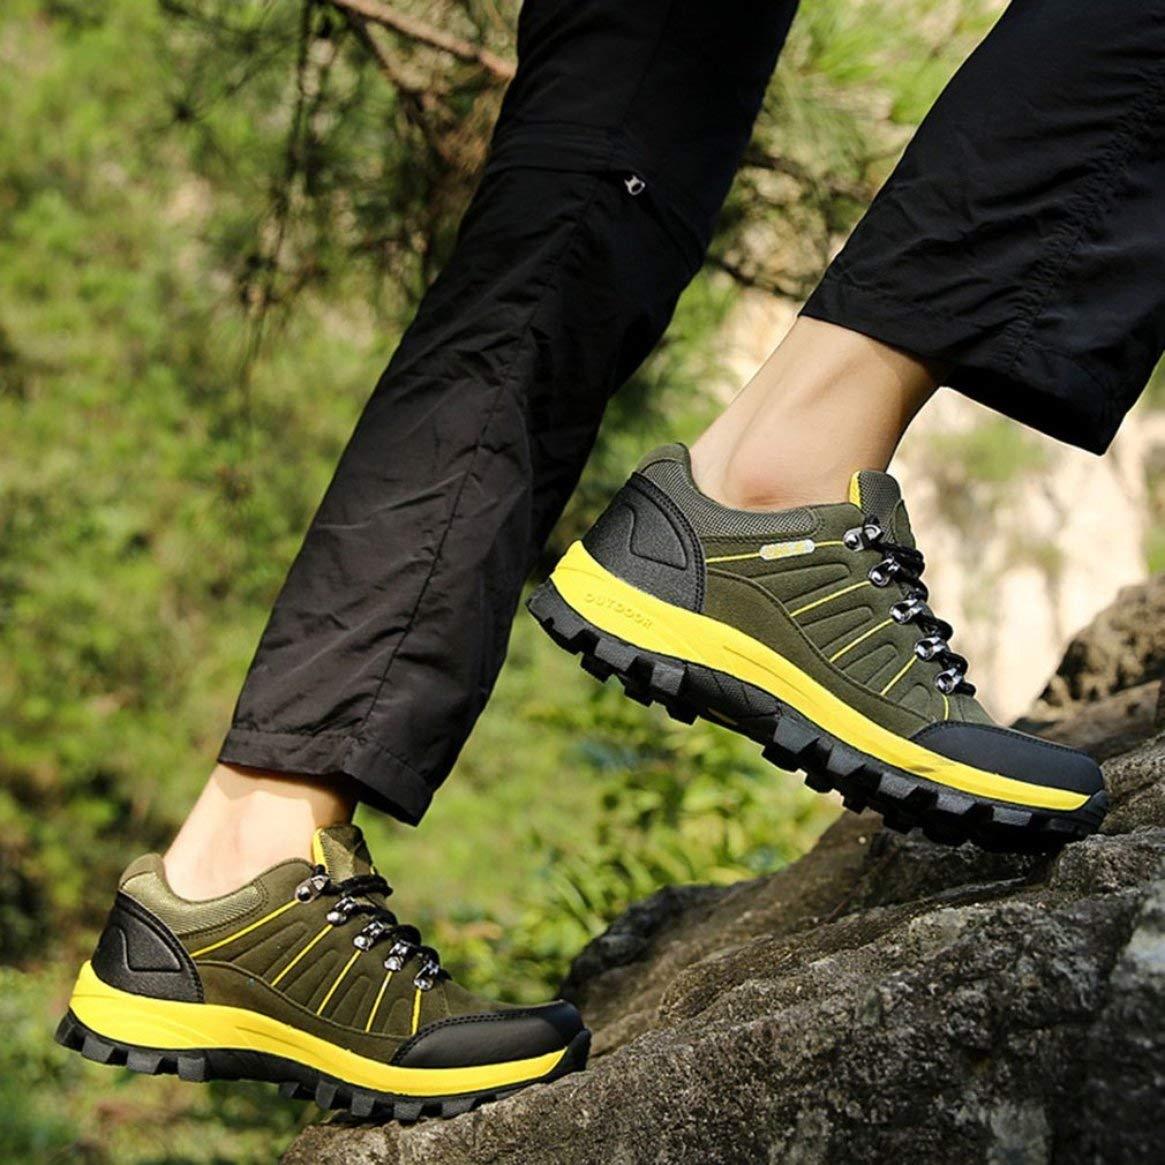 611cadd2a ... Zapatos de Excursionismo al Aire Libre Botas Botas Botas de montañismo  Impermeables Hombre con Cordones Calzado